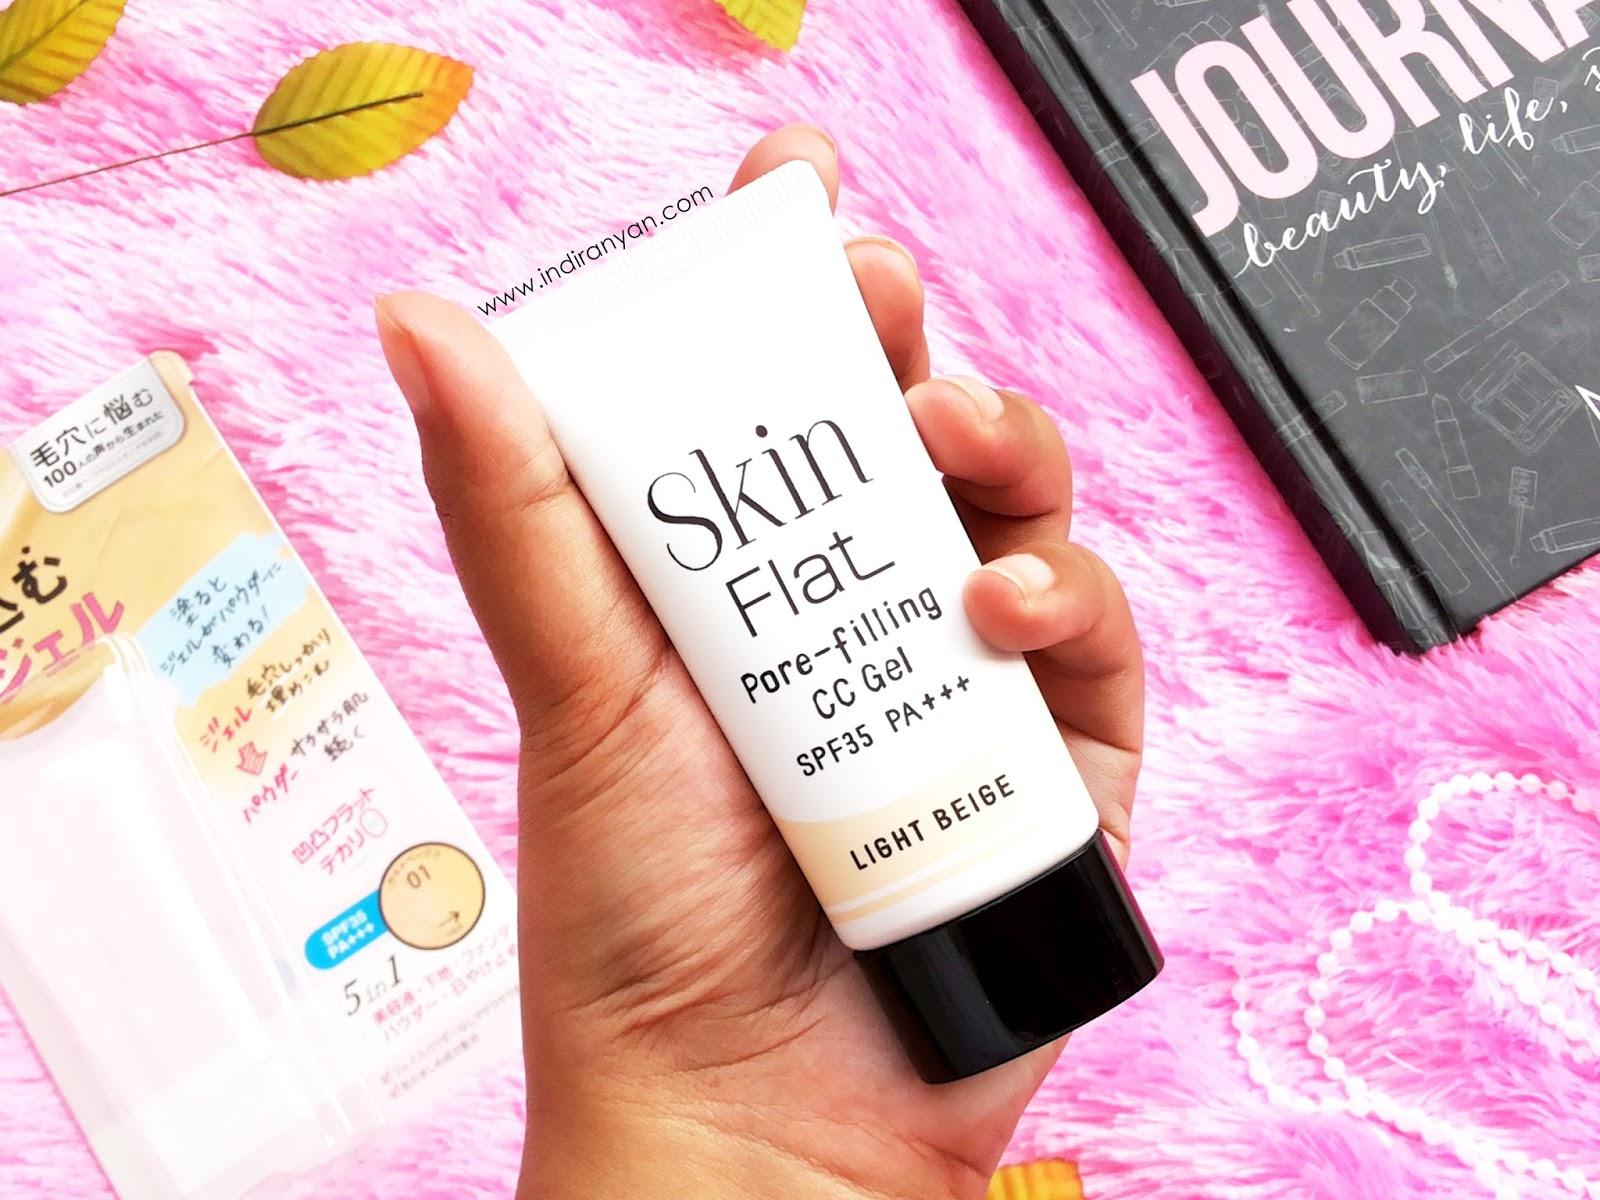 skin-flat-pore-filling-cc-gel-review, skin-flat-cc-gel